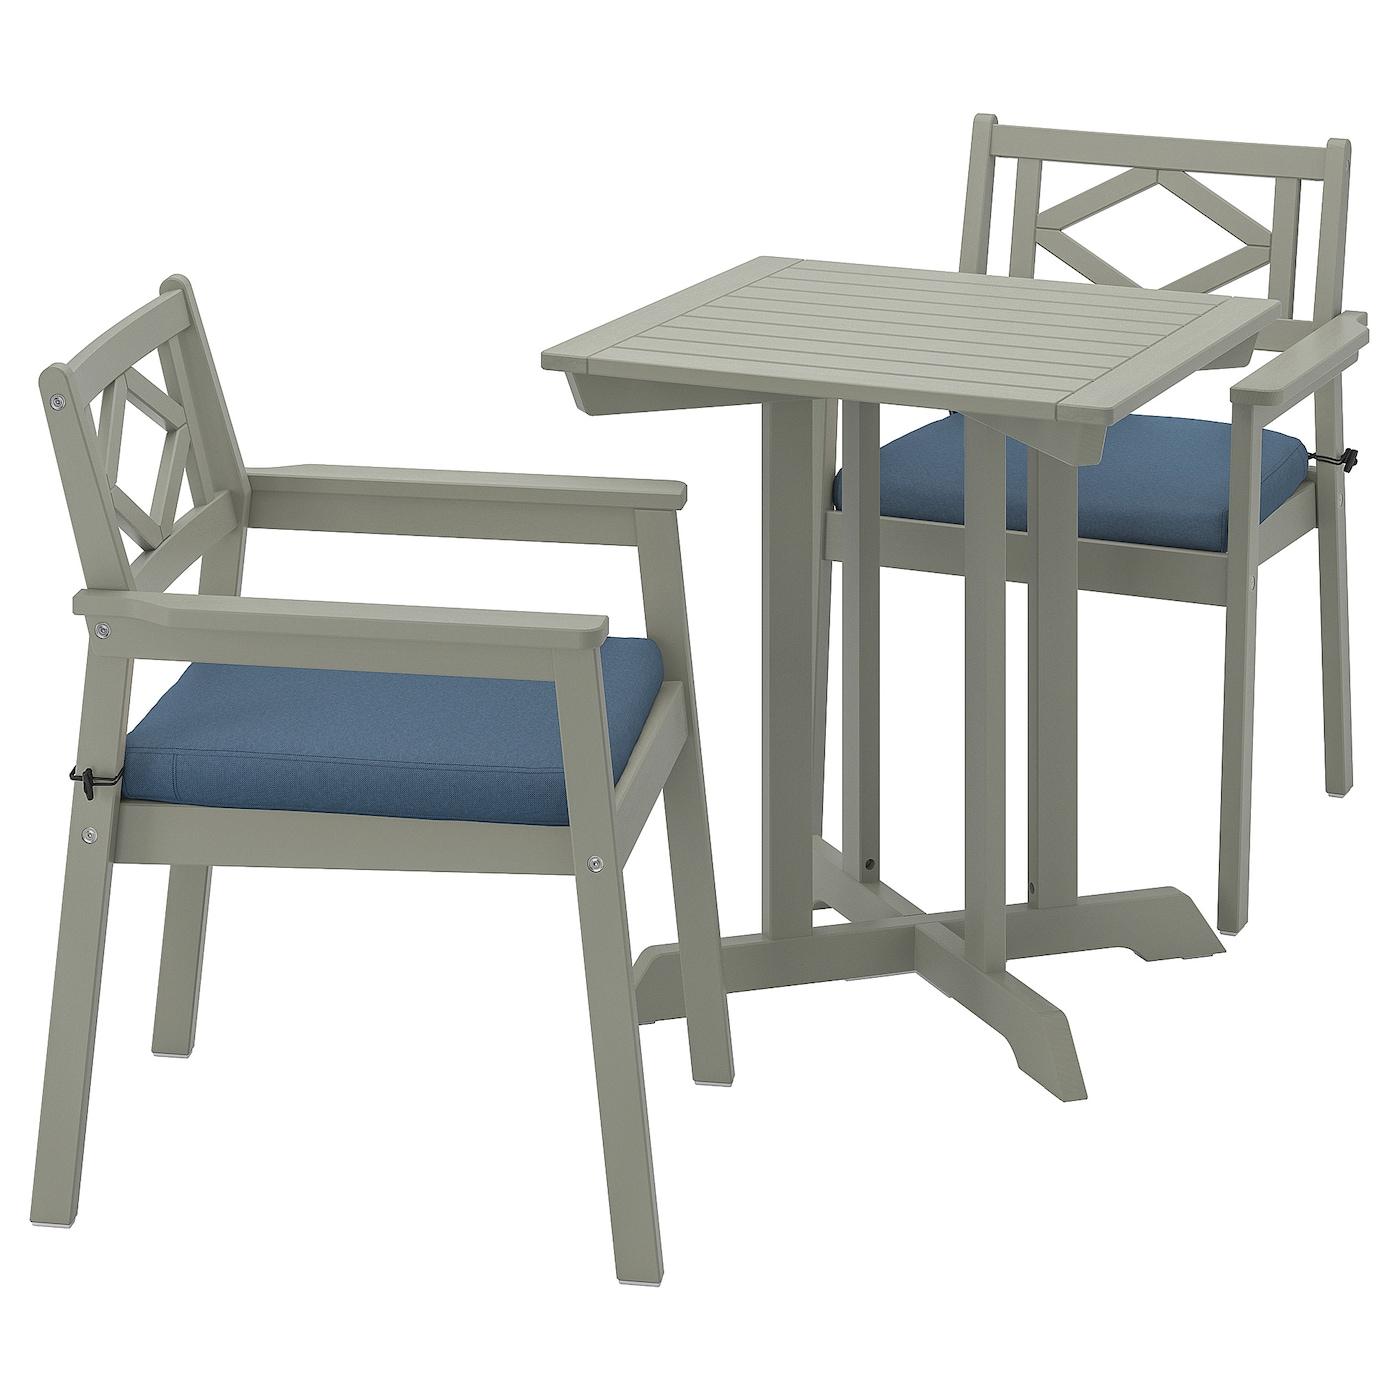 Bondholmen Table 2 Chairs W Armrests Outdoor Grey Stained Froson Duvholmen Blue Ikea